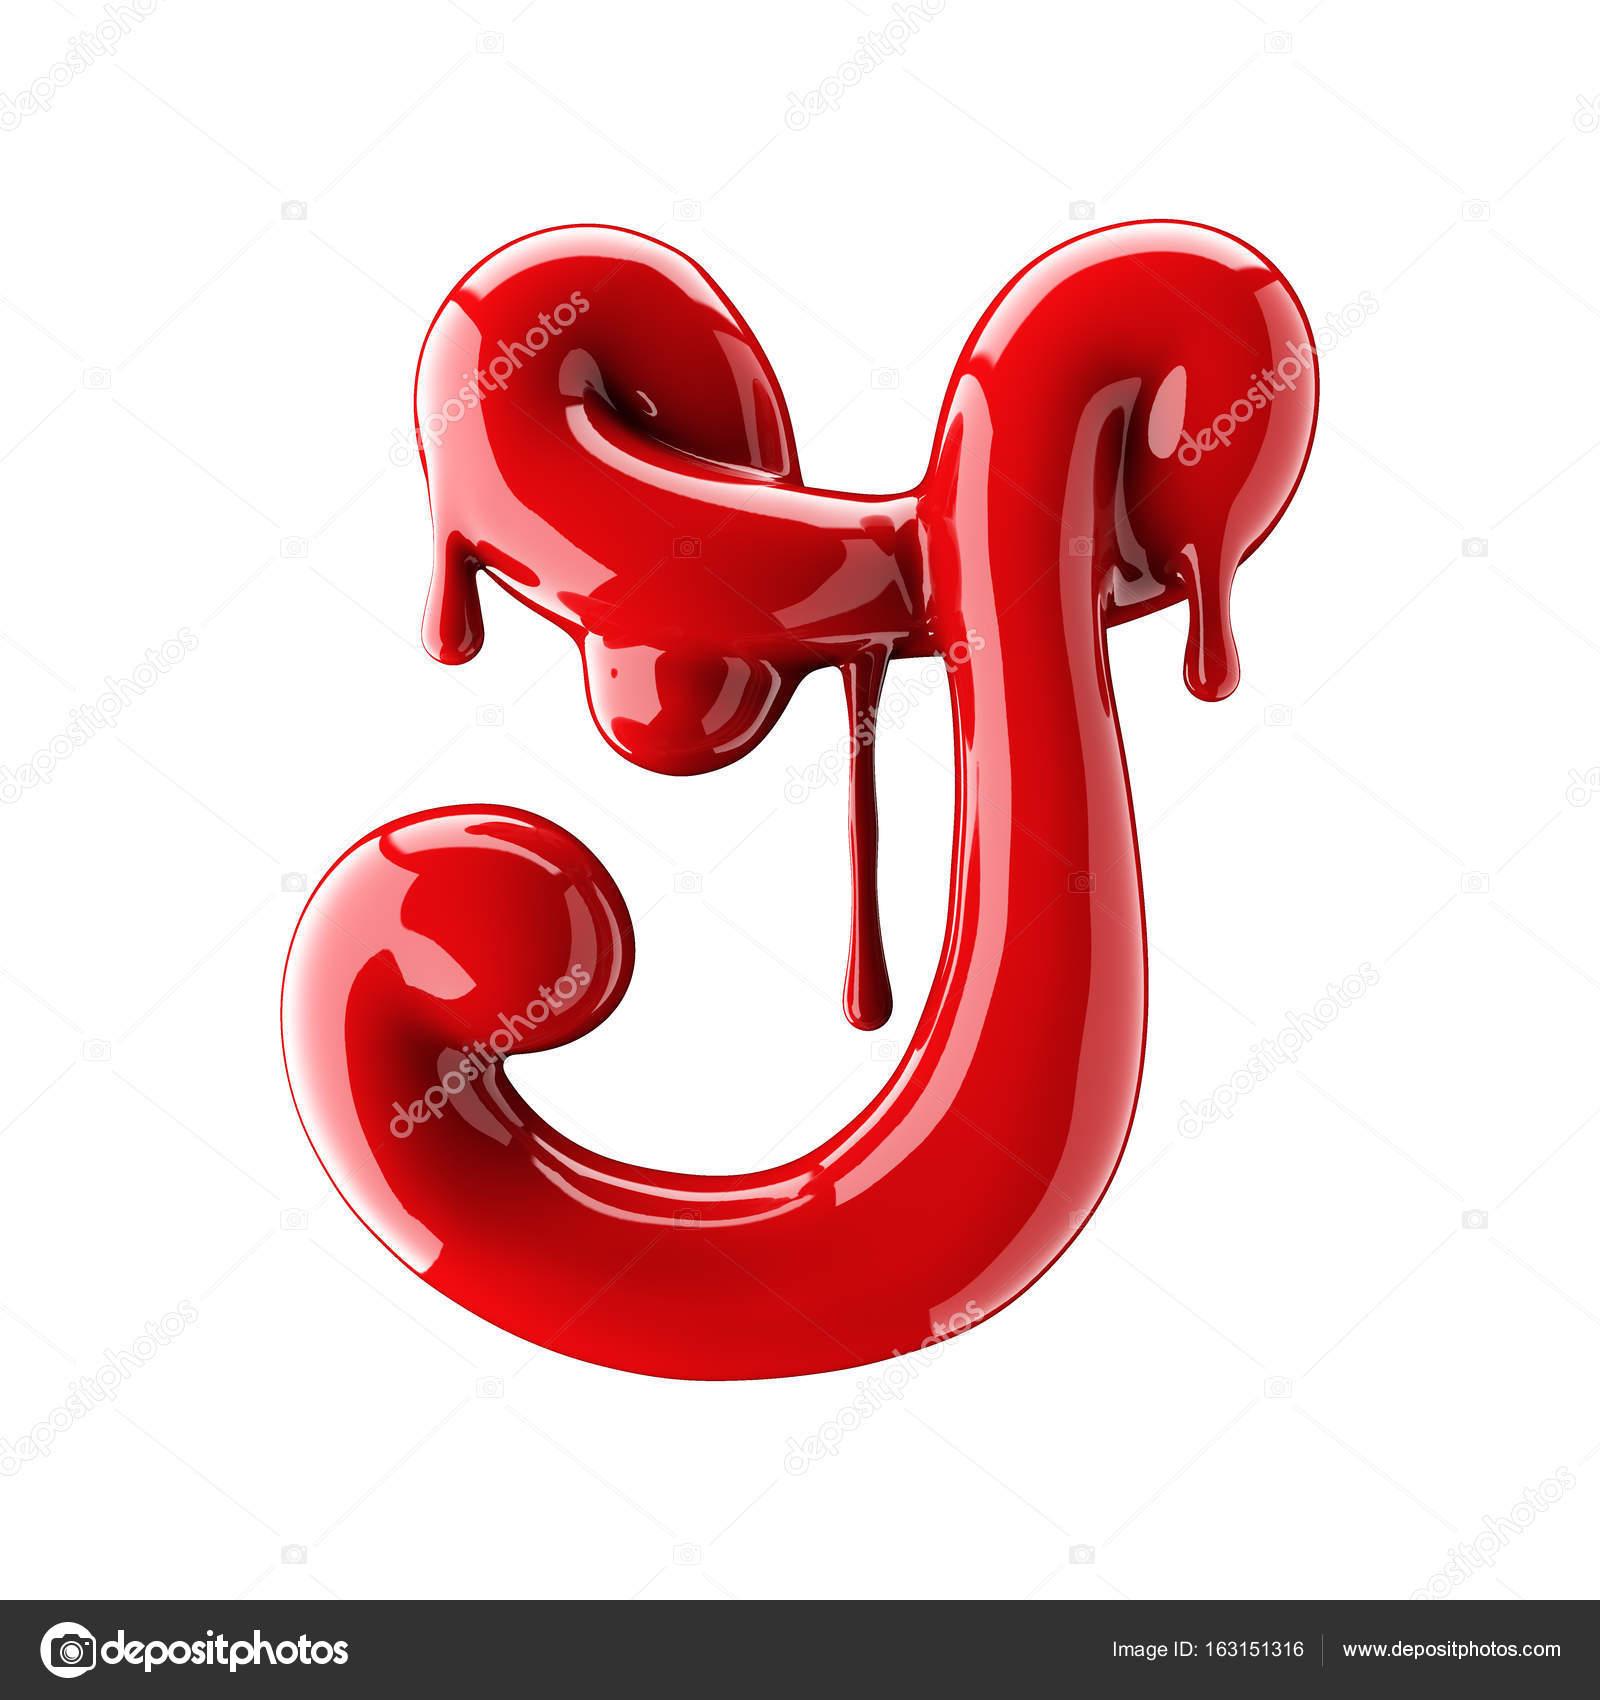 Leaky red alphabet isolated on white background handwritten cursive leaky red alphabet isolated on white background handwritten cursive letter j stock photo buycottarizona Gallery